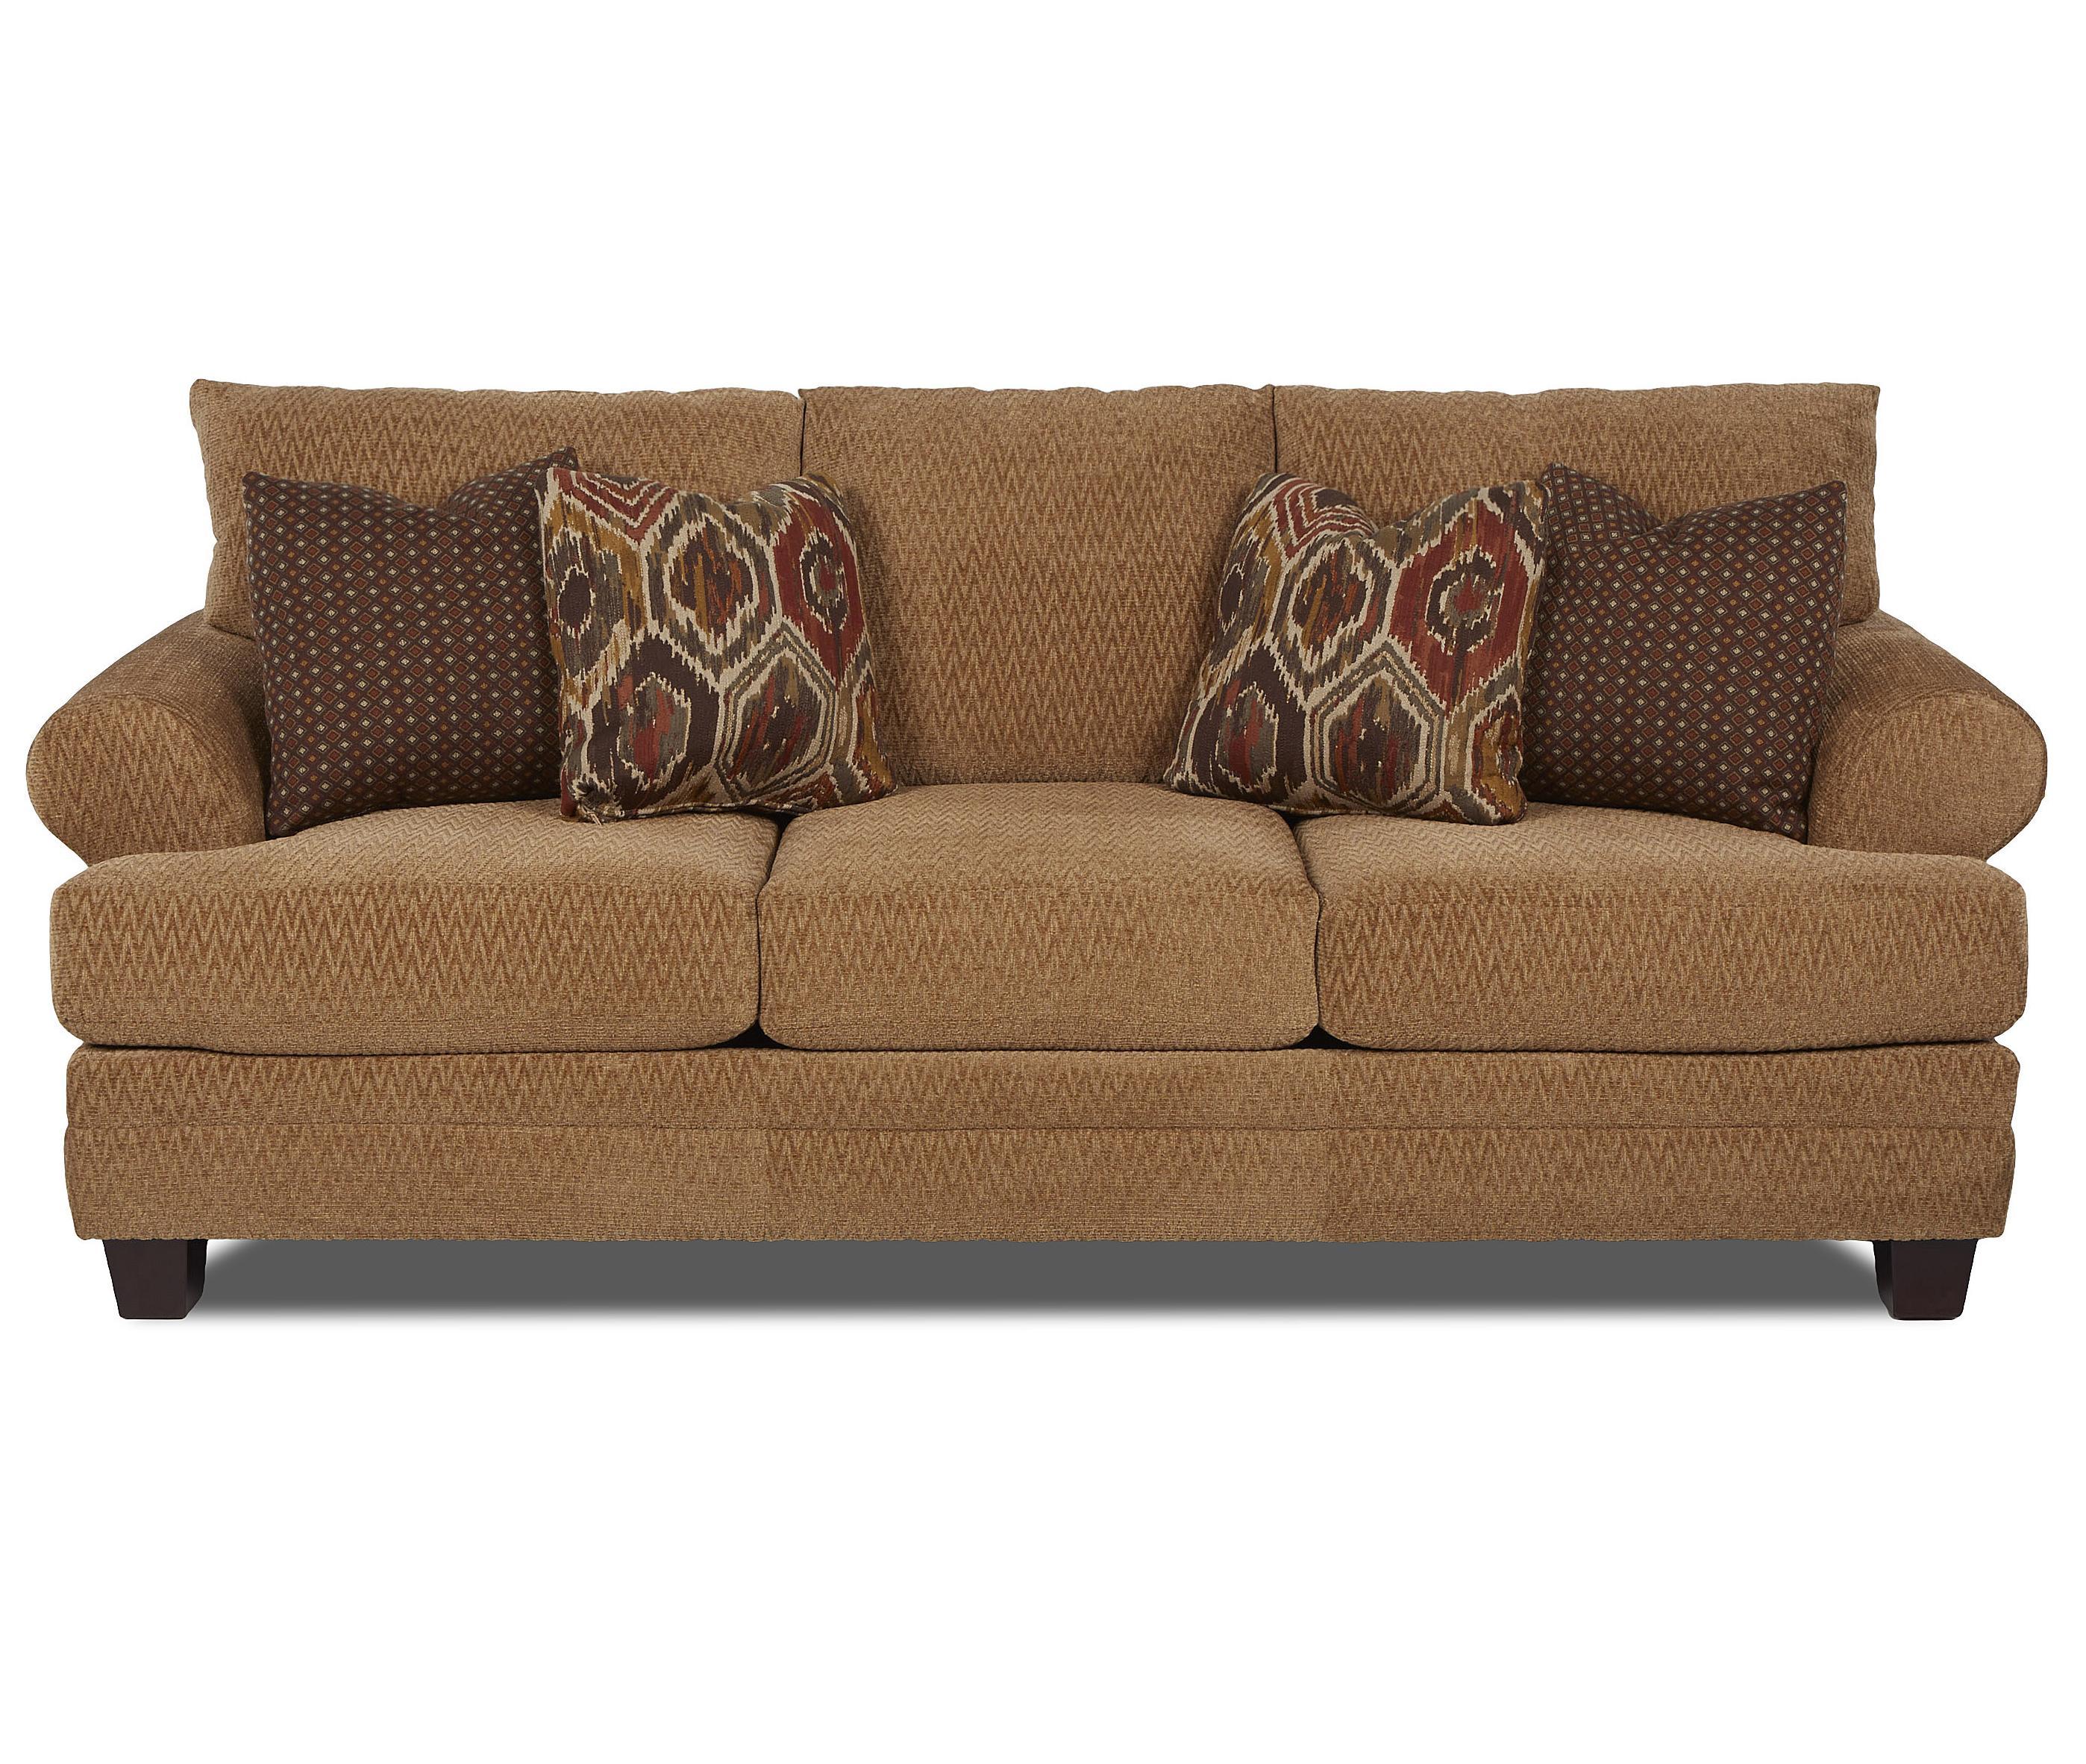 Avery Sofa by Klaussner at Johnny Janosik